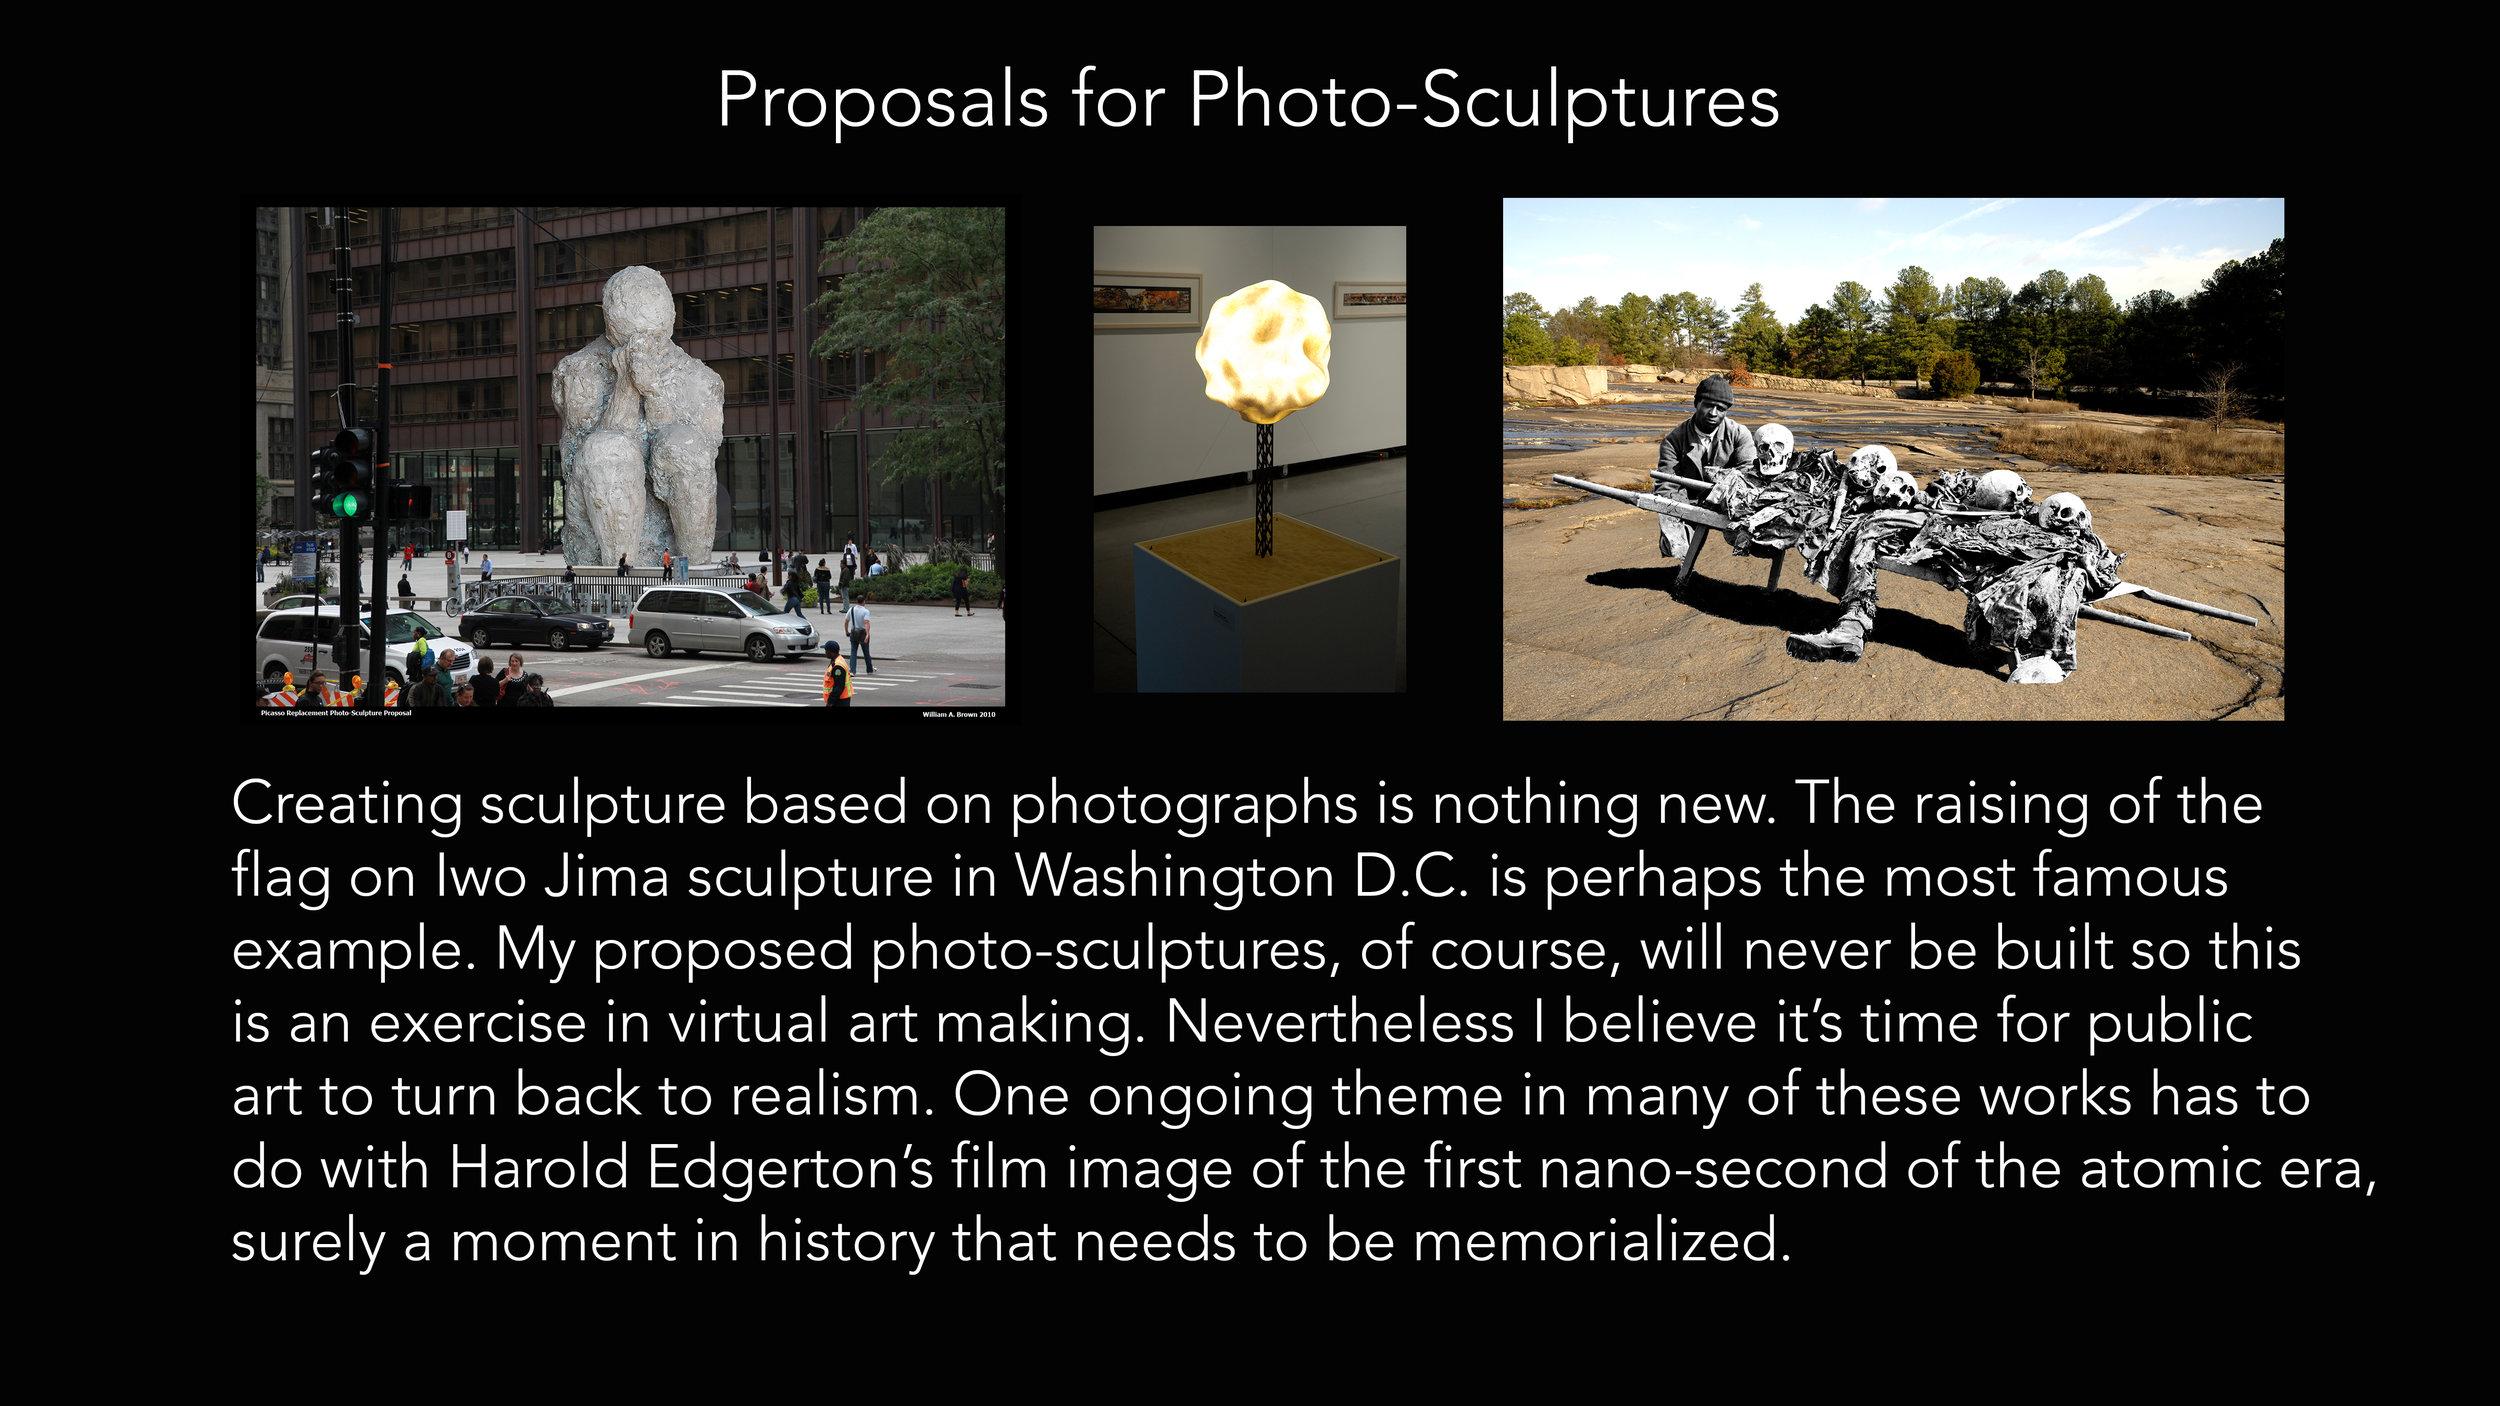 16x9 photo sculpture.jpg